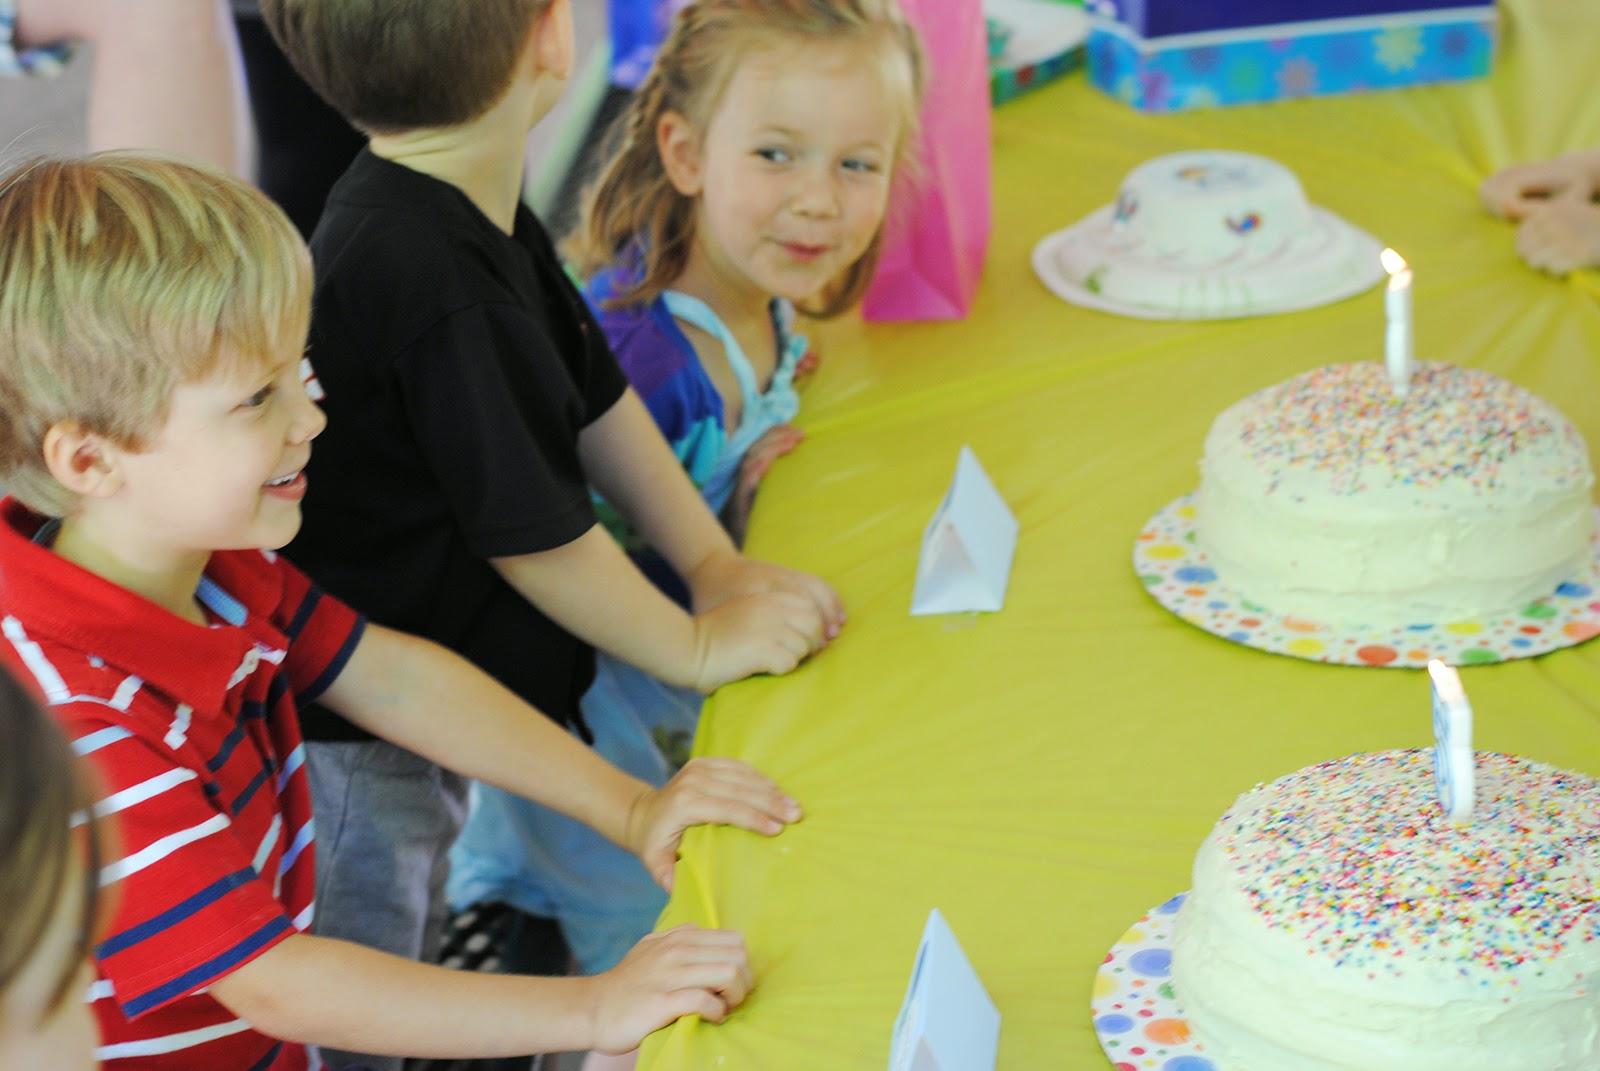 how to make birthday cake sims 4